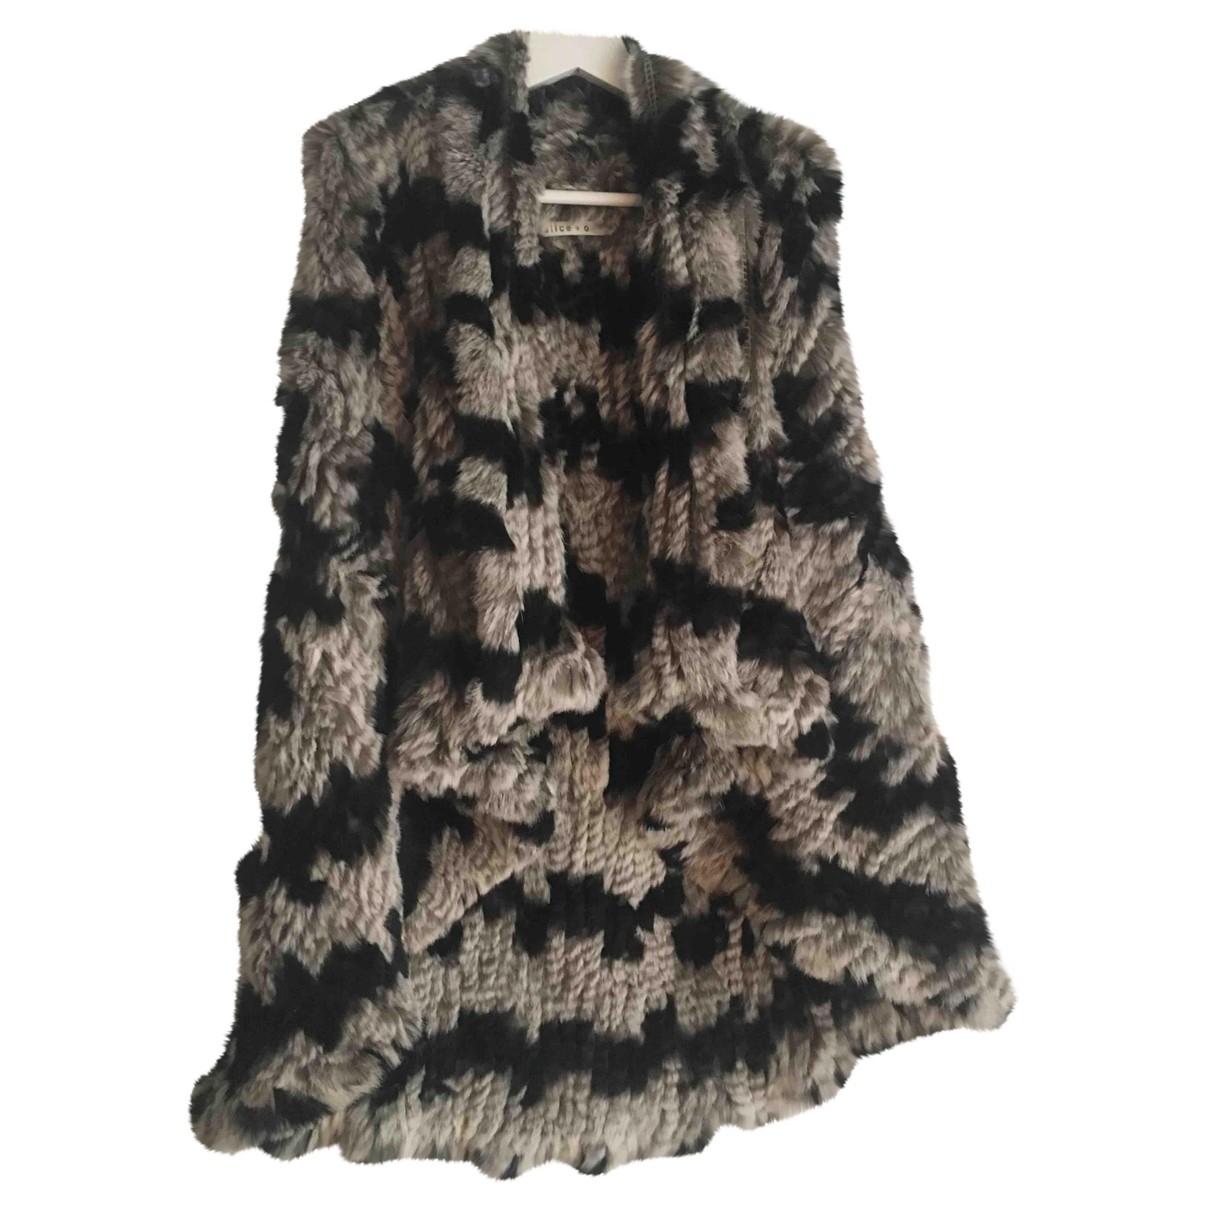 Alice & Olivia \N Multicolour Rabbit jacket for Women S International